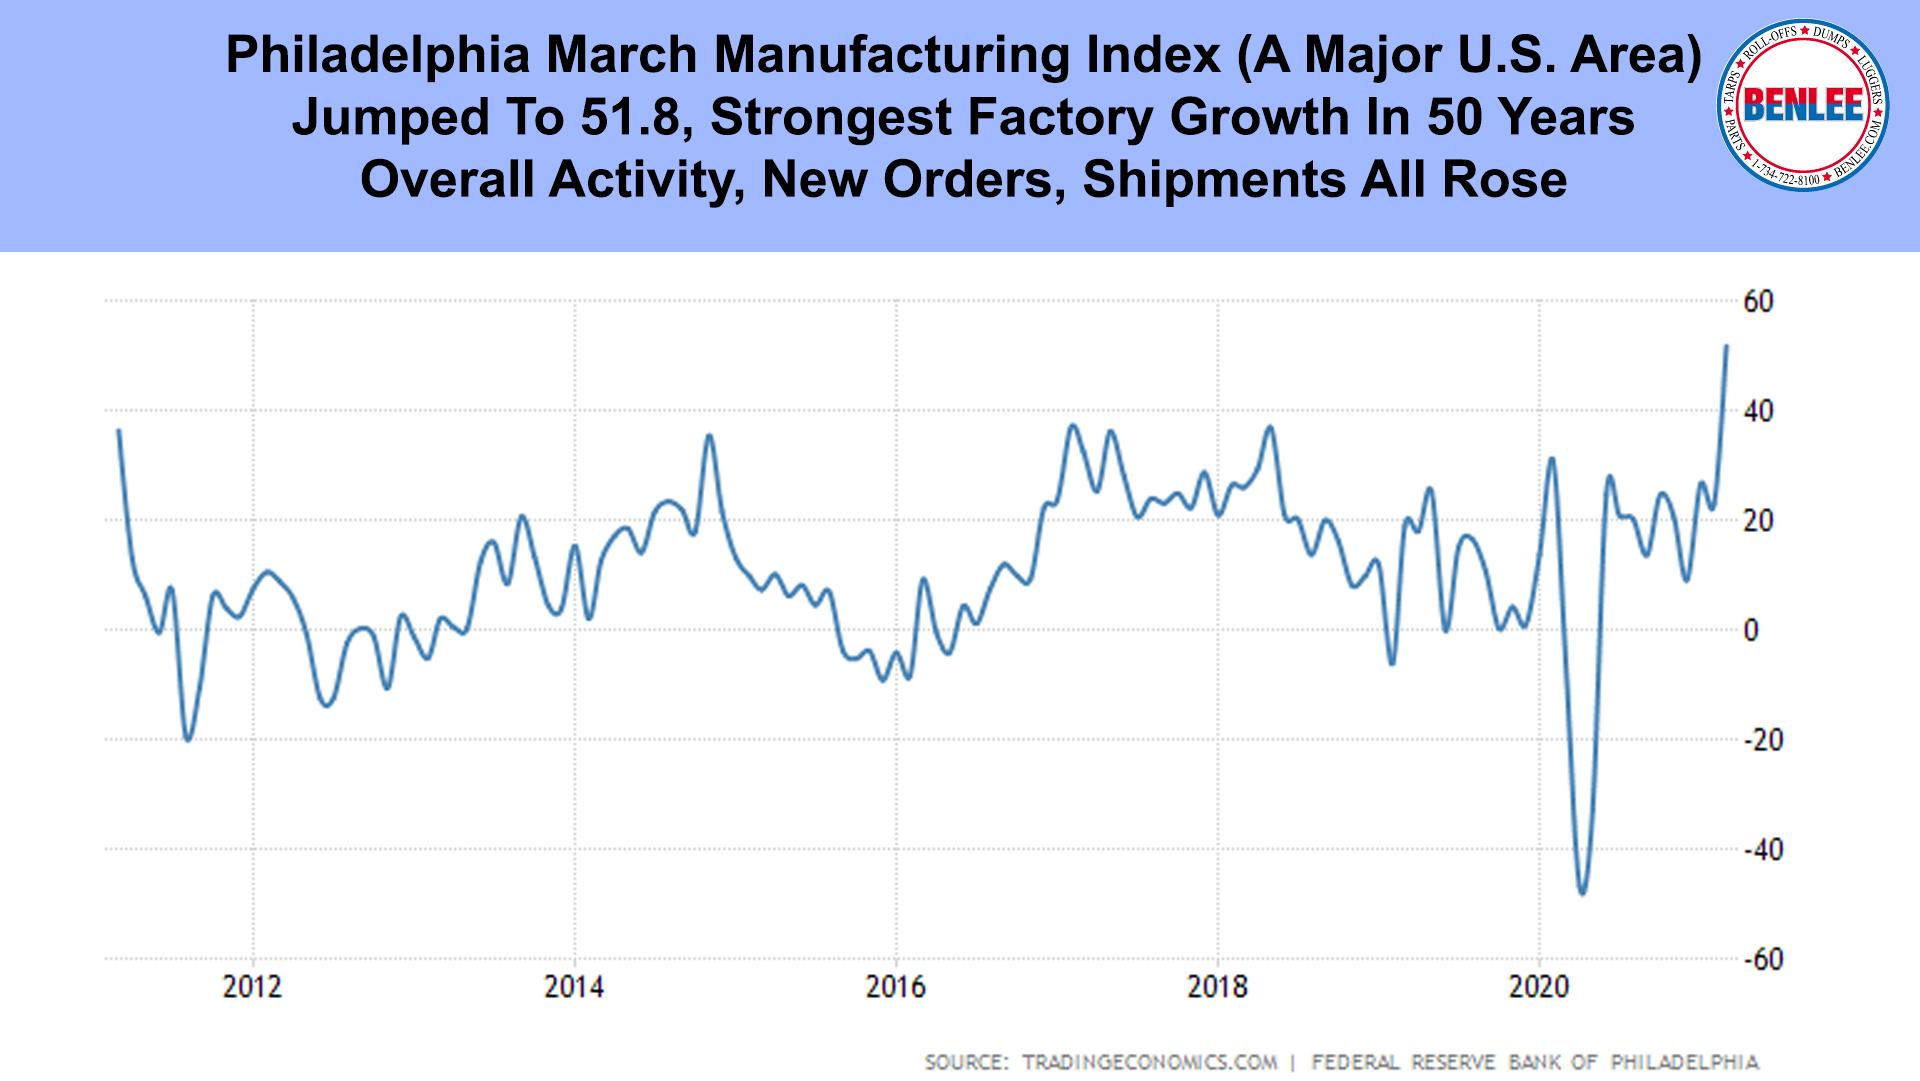 Philadelphia March Manufacturing Index